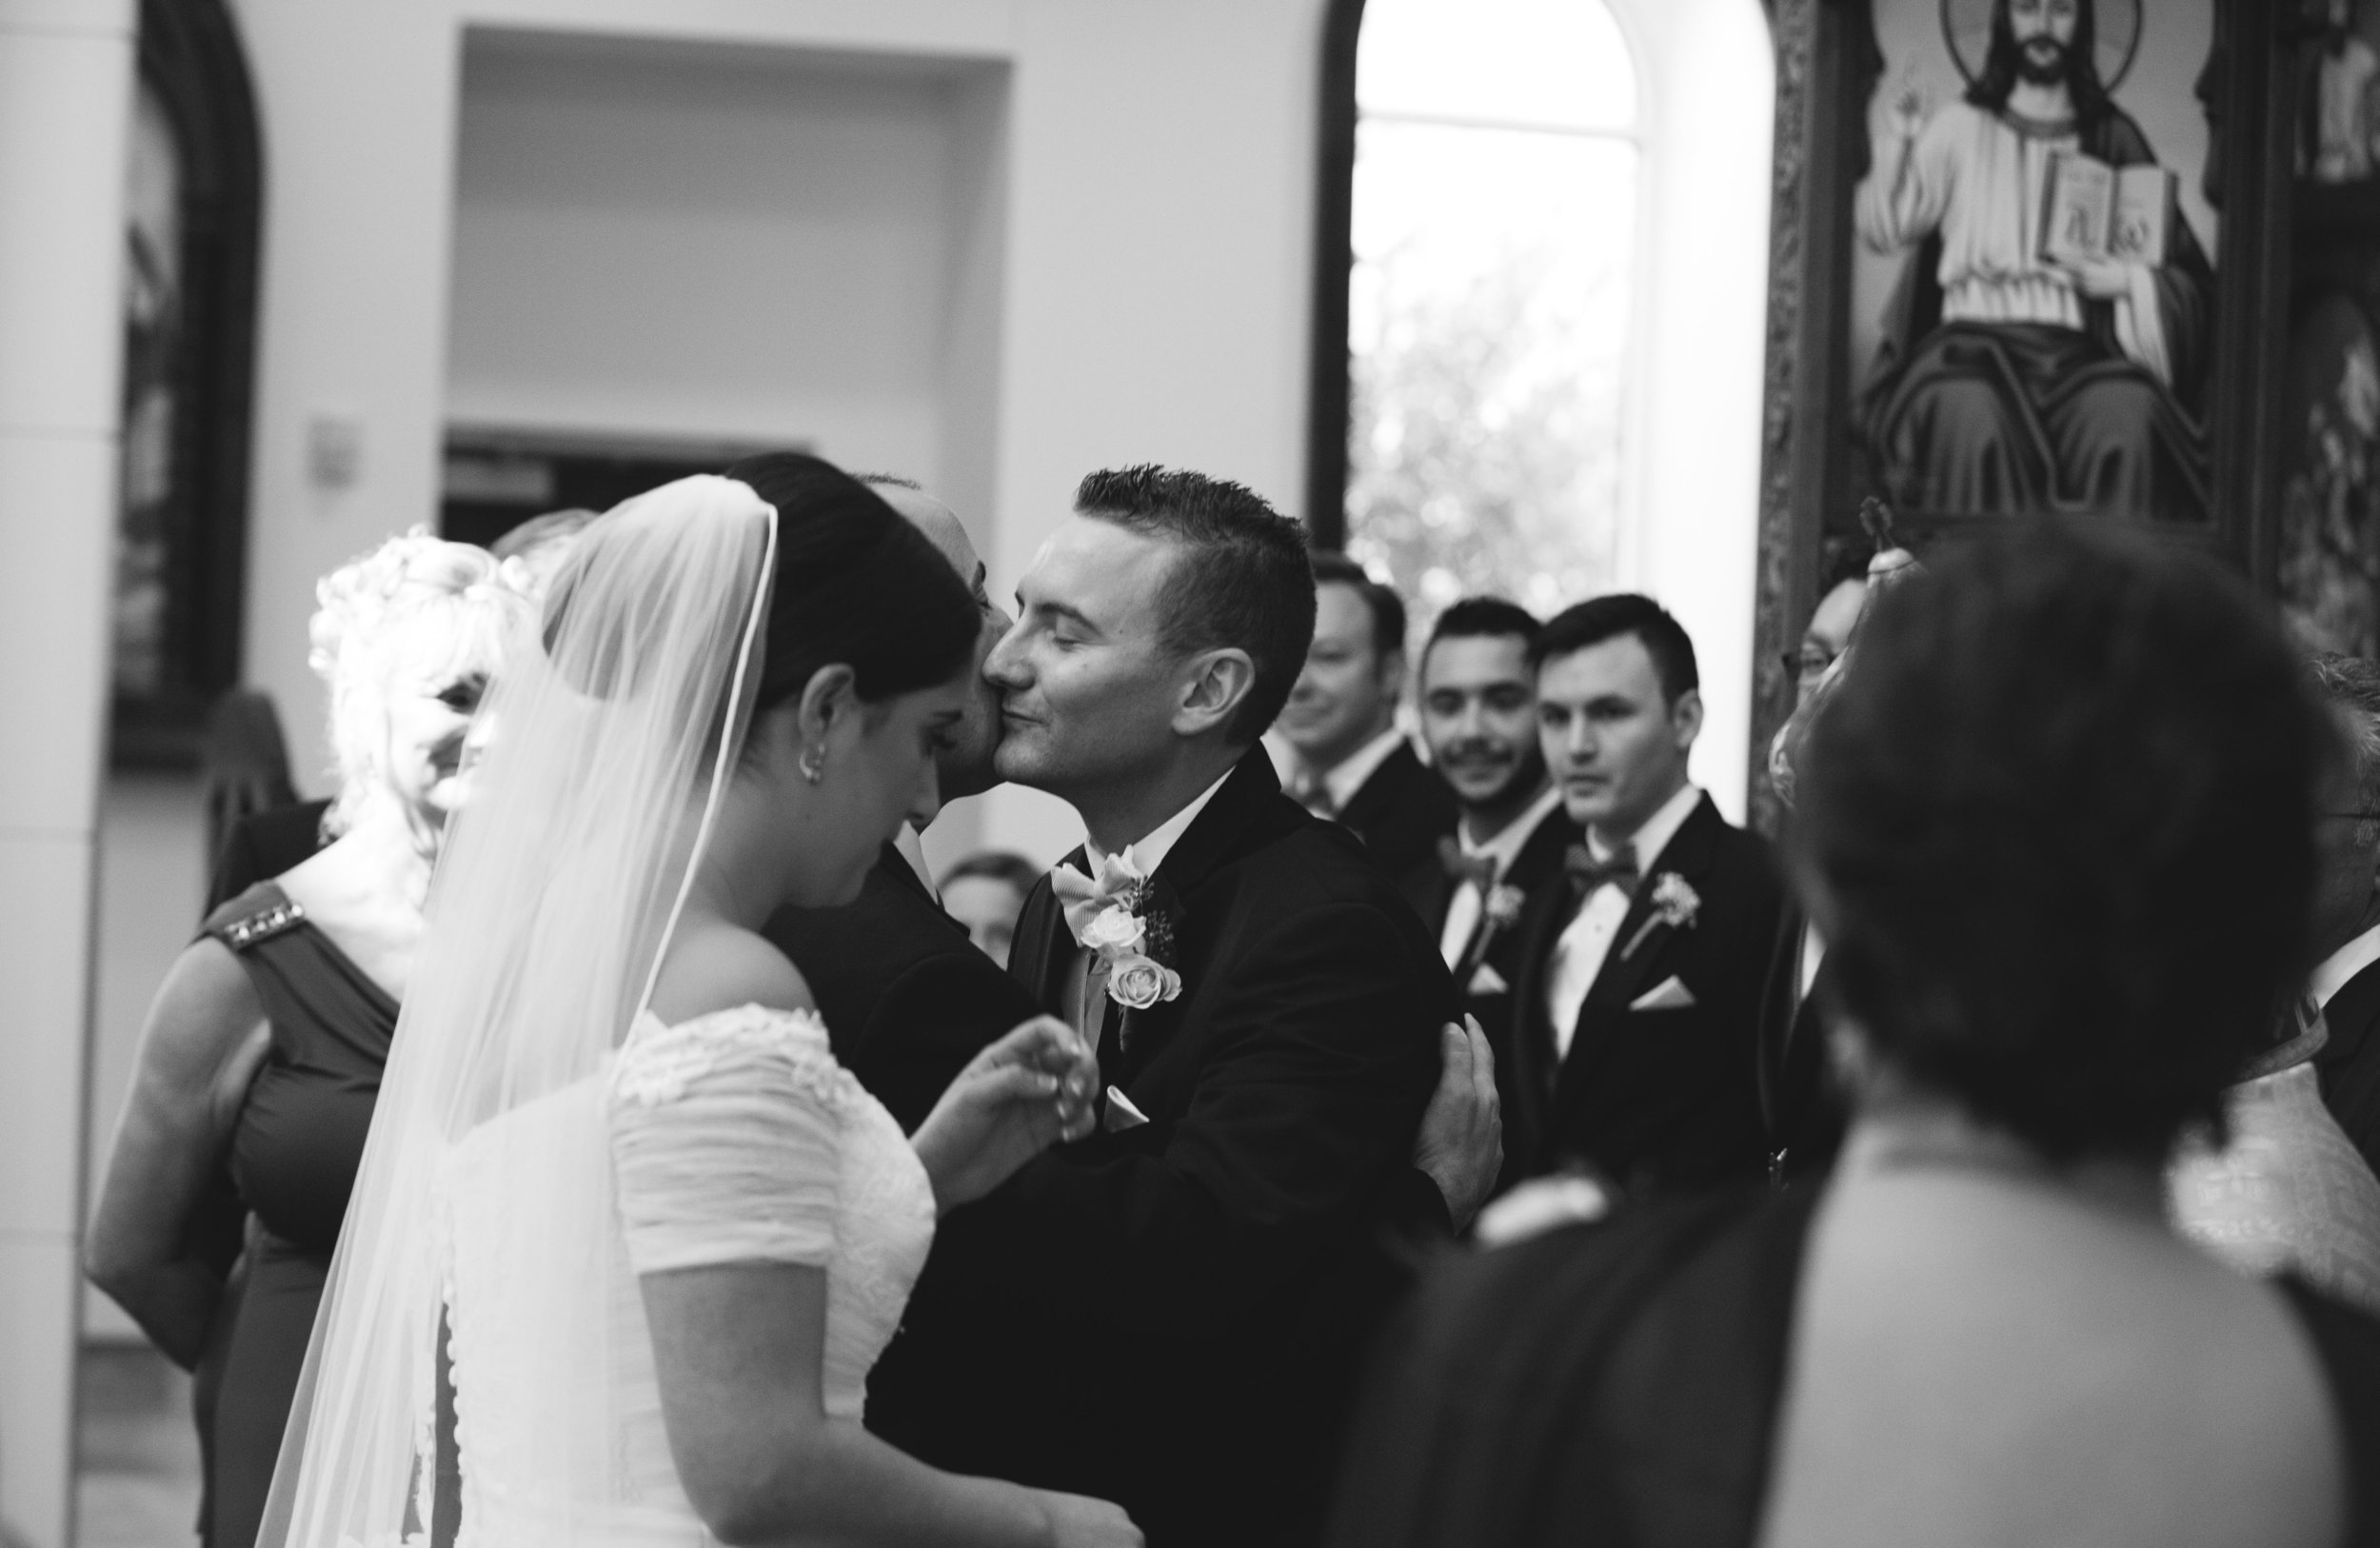 ATGI_Magali & Josh Wedding_2S8A0601.jpg